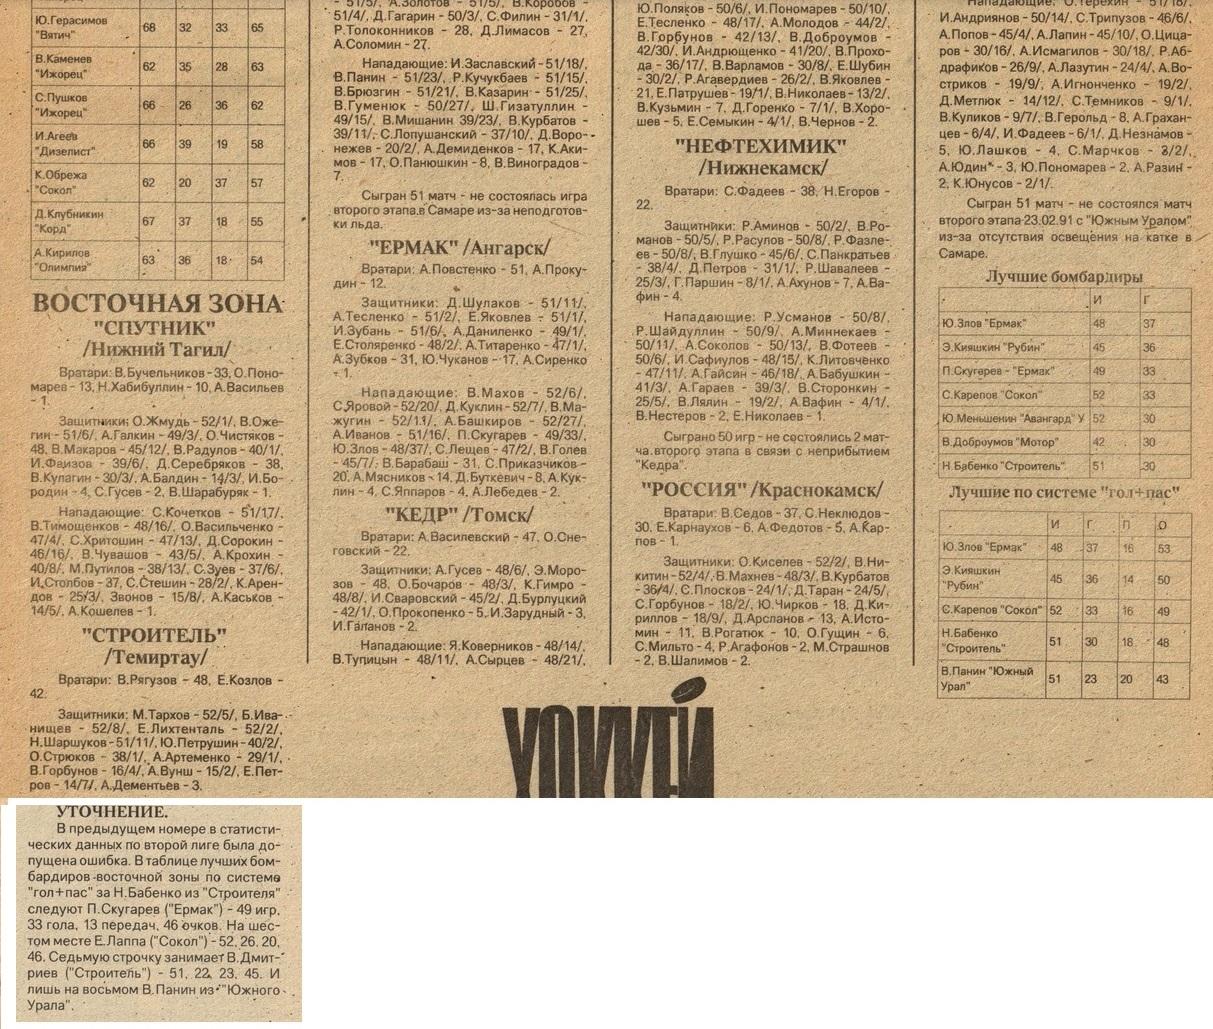 90-91 статистика 2 лиги 4 с доп.jpg